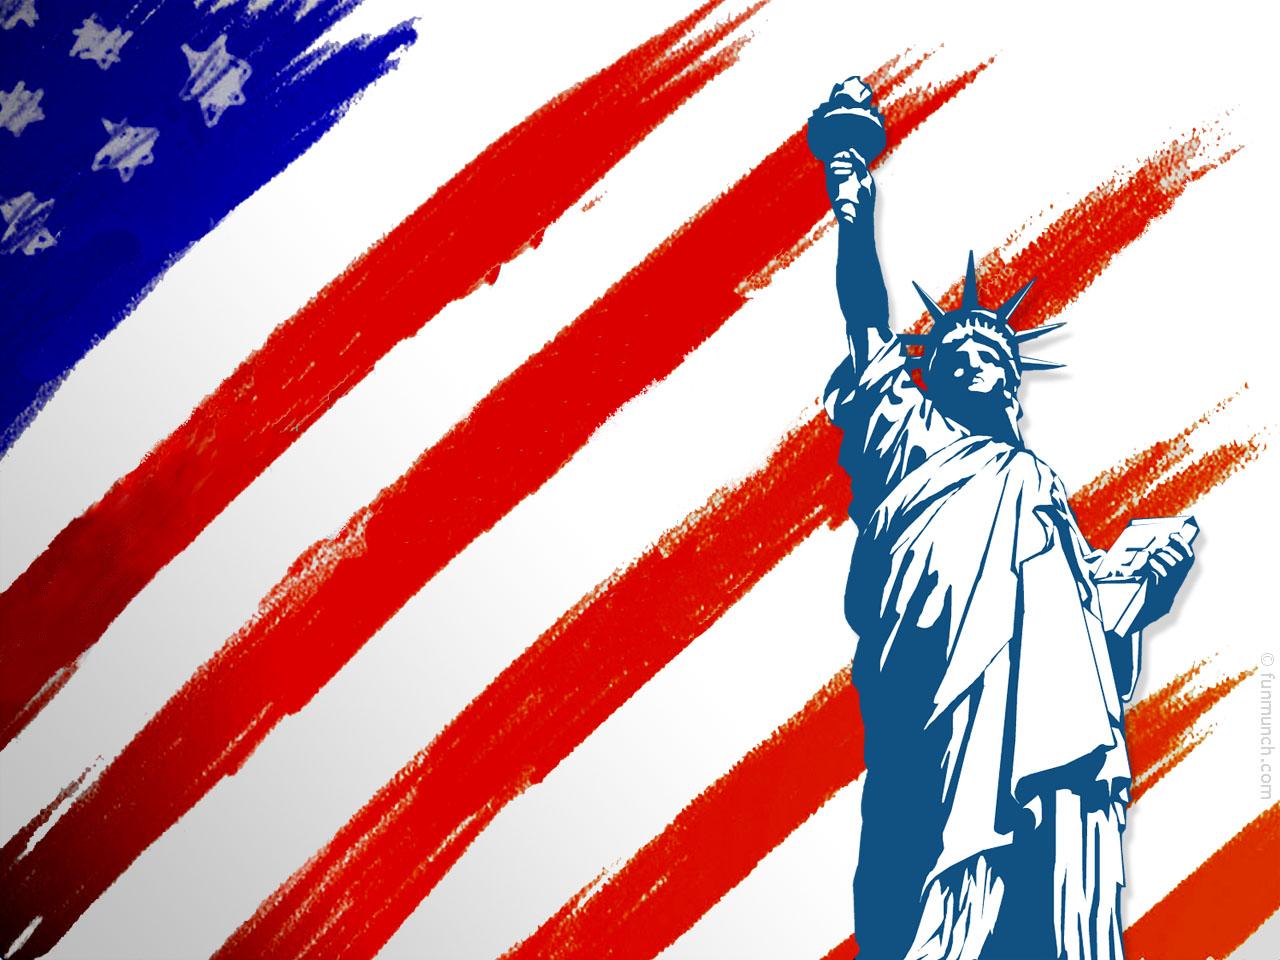 moleskinex19: American Flag Wallpaper